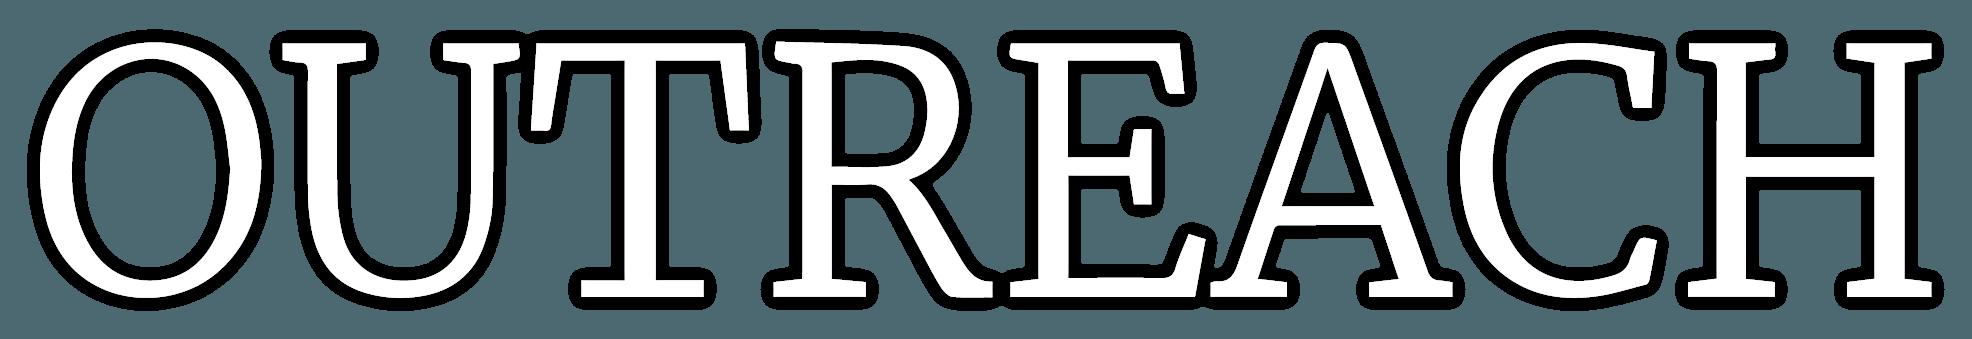 Outreach-Text-2019